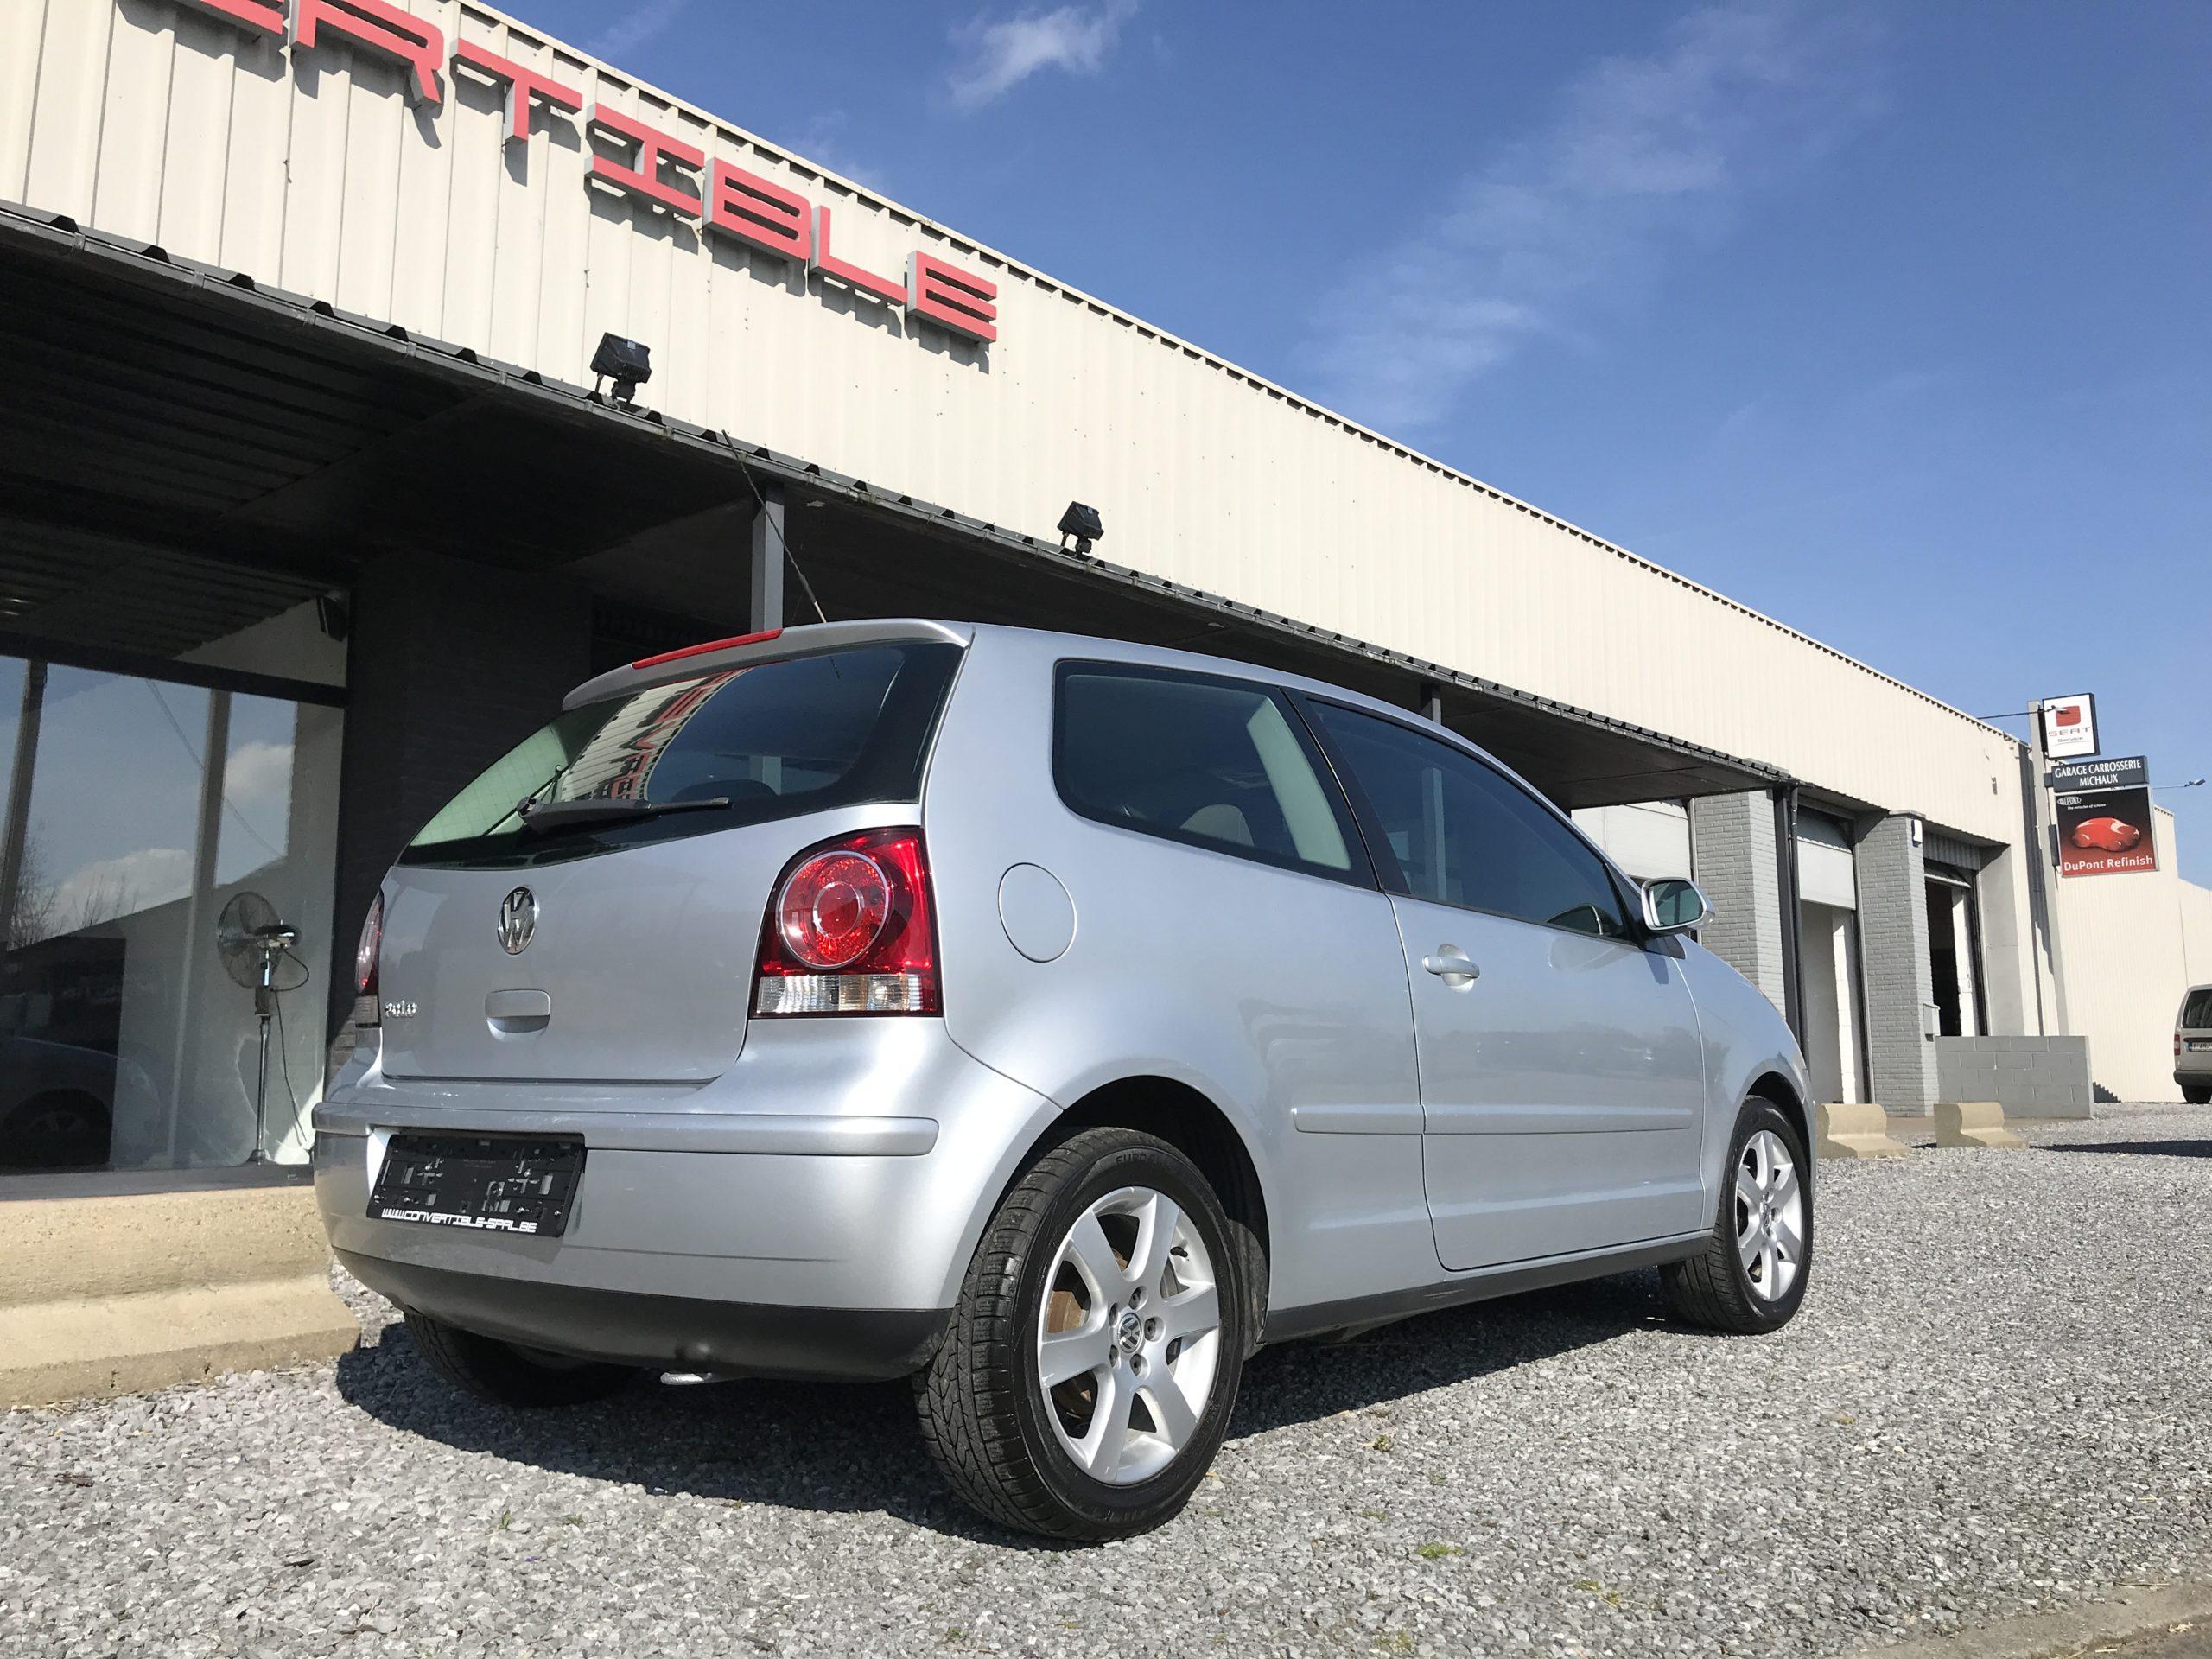 VW POLO 1.2 ESSENCE GARANTIE DE 12 MOIS full